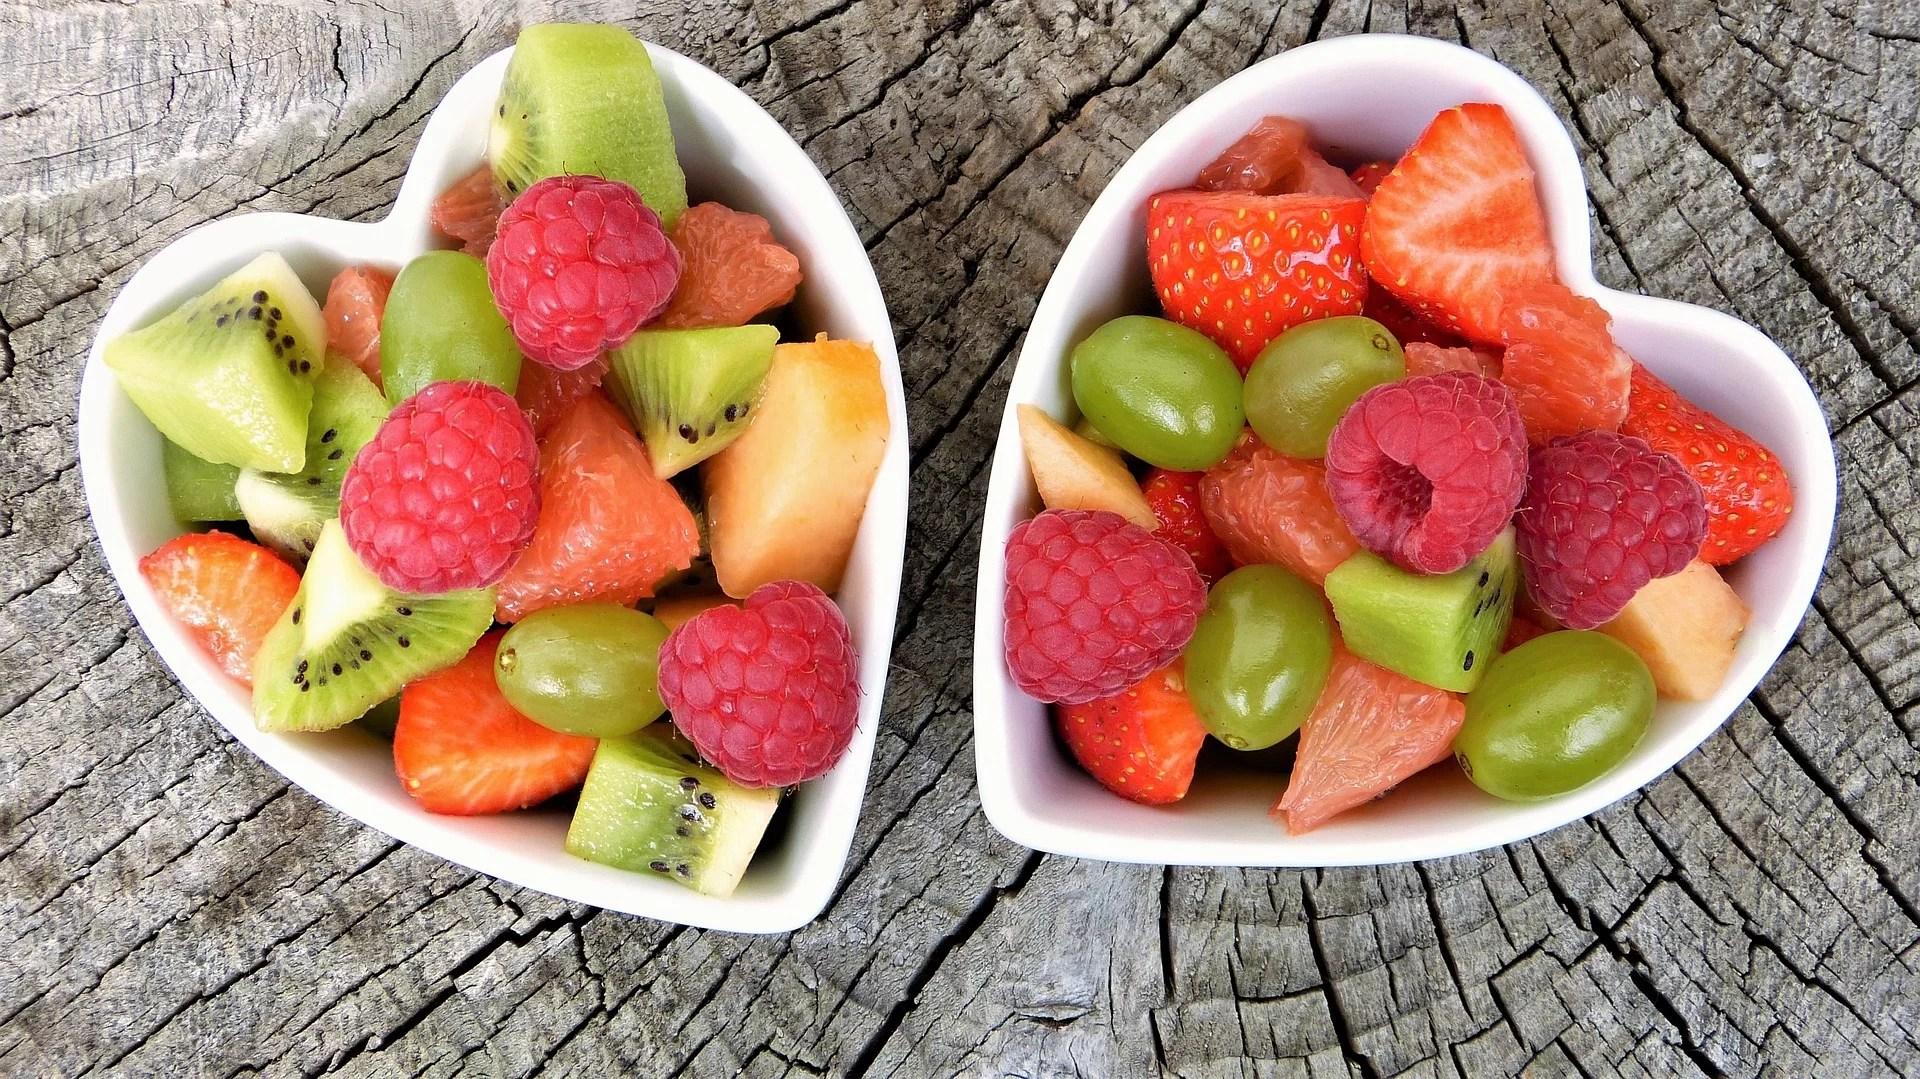 Vitamins & Food Supplements